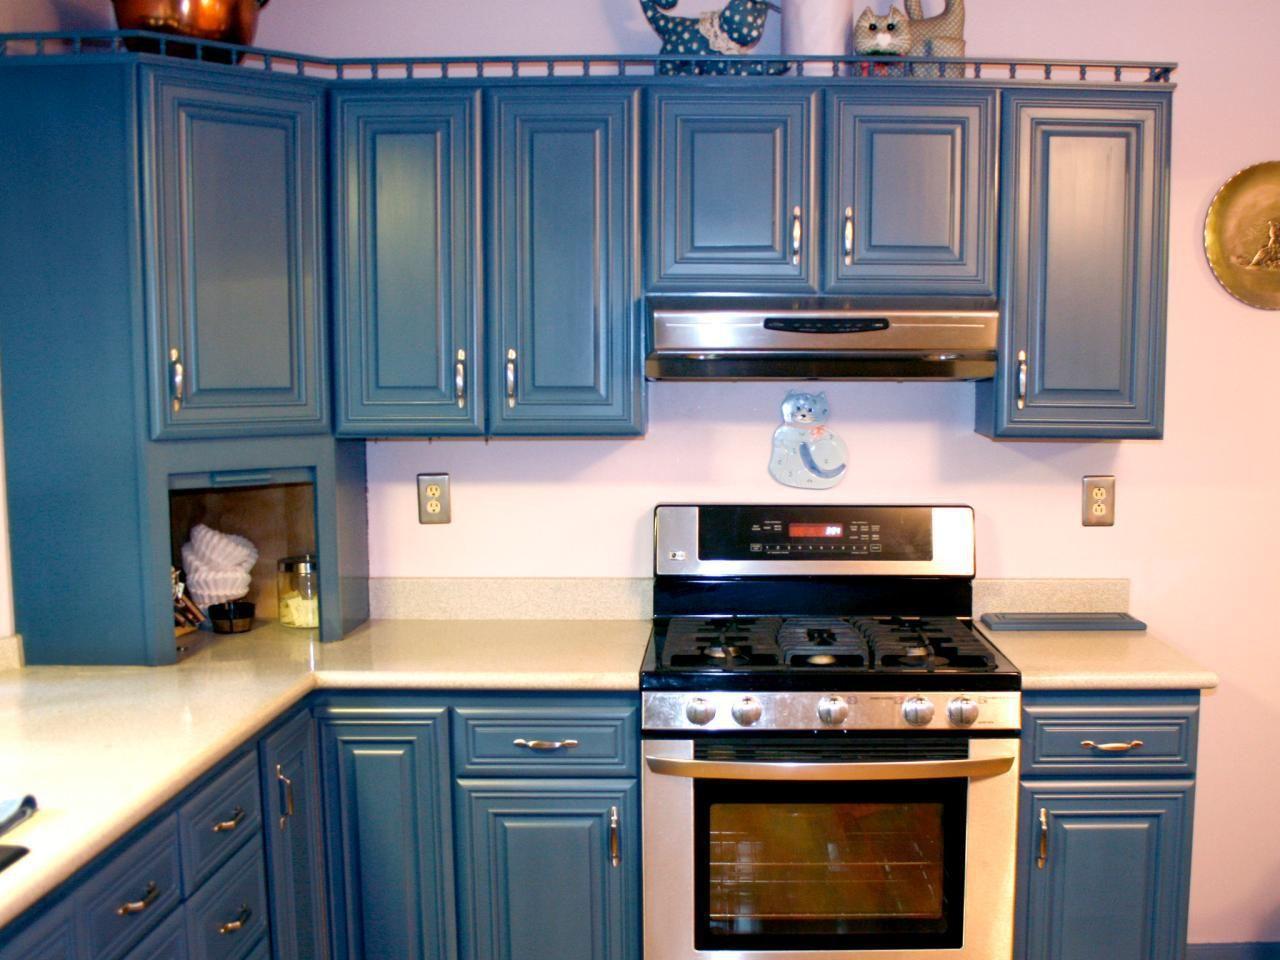 Kitchen Ideas Design Cabinets Islands Backsplashes Hgtv Shaped Kitchen Design Ideas Remodels Photos Matchstick Tile Cork